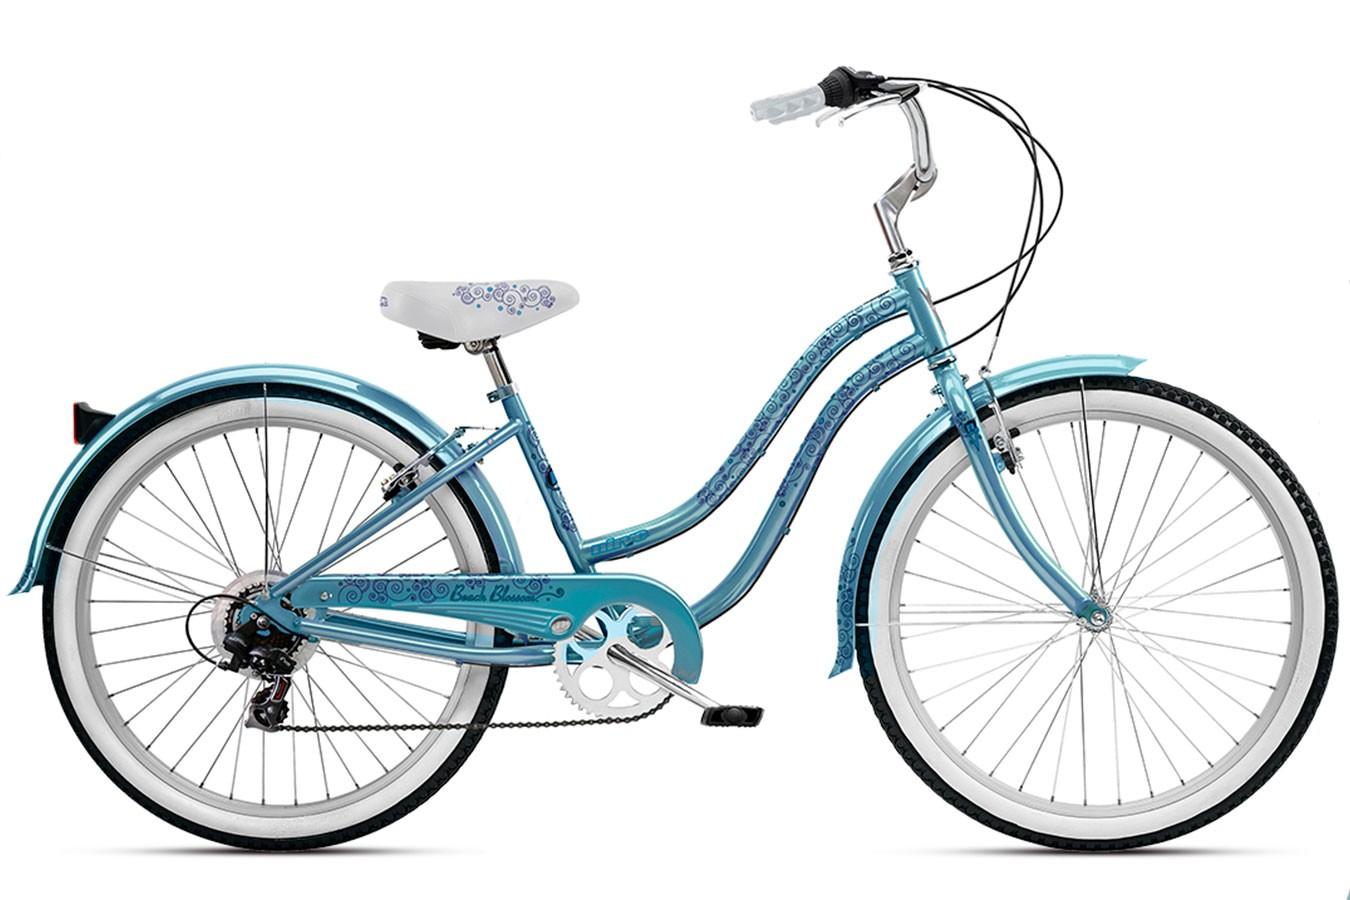 Ni Bicicleta Ni Bicicleto: Bicicleta 26 Feminina Beach Blossom